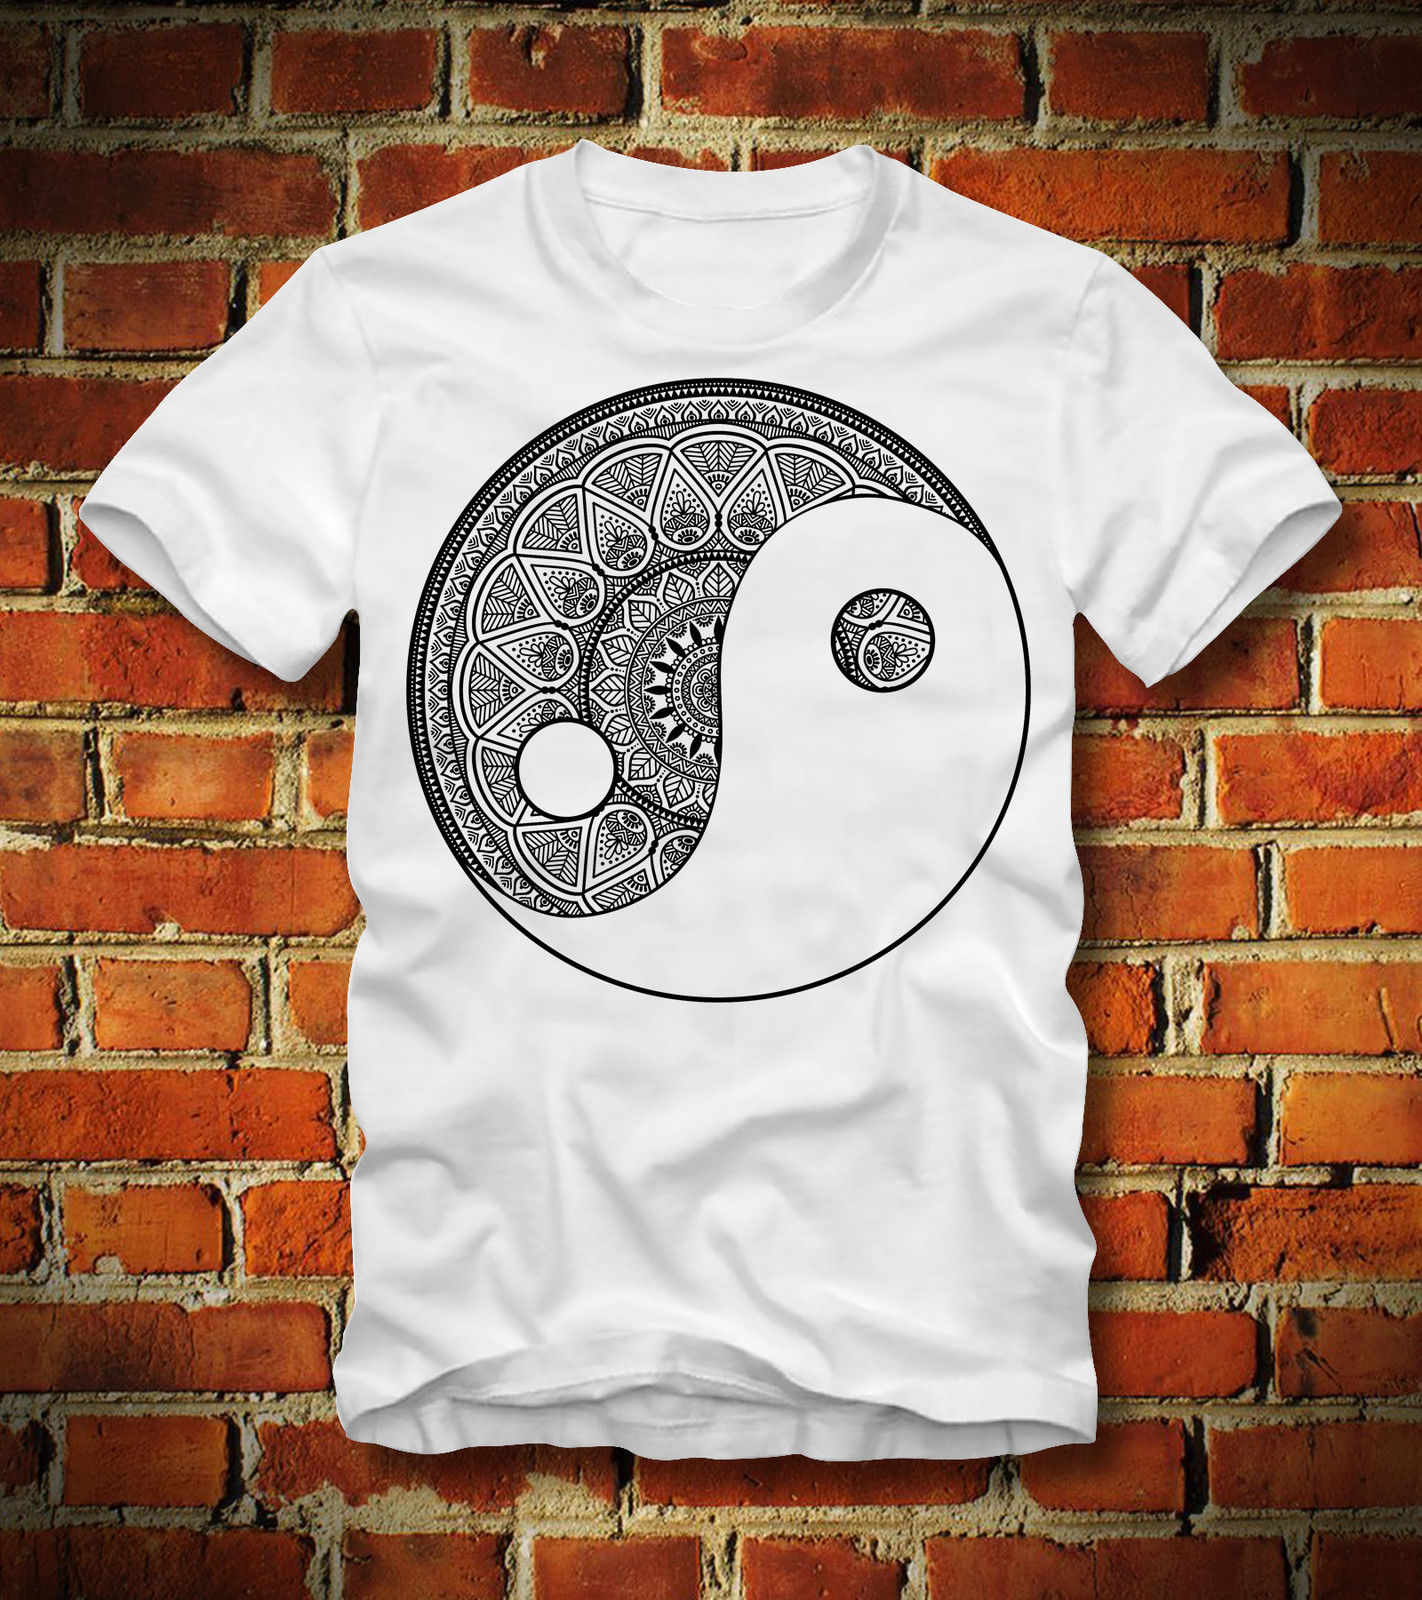 2019 nueva camiseta de verano divertida camiseta YIN y YANG MANDALA ZEN budismo ANTI estrés FENG SHUI QI camiseta personalizada